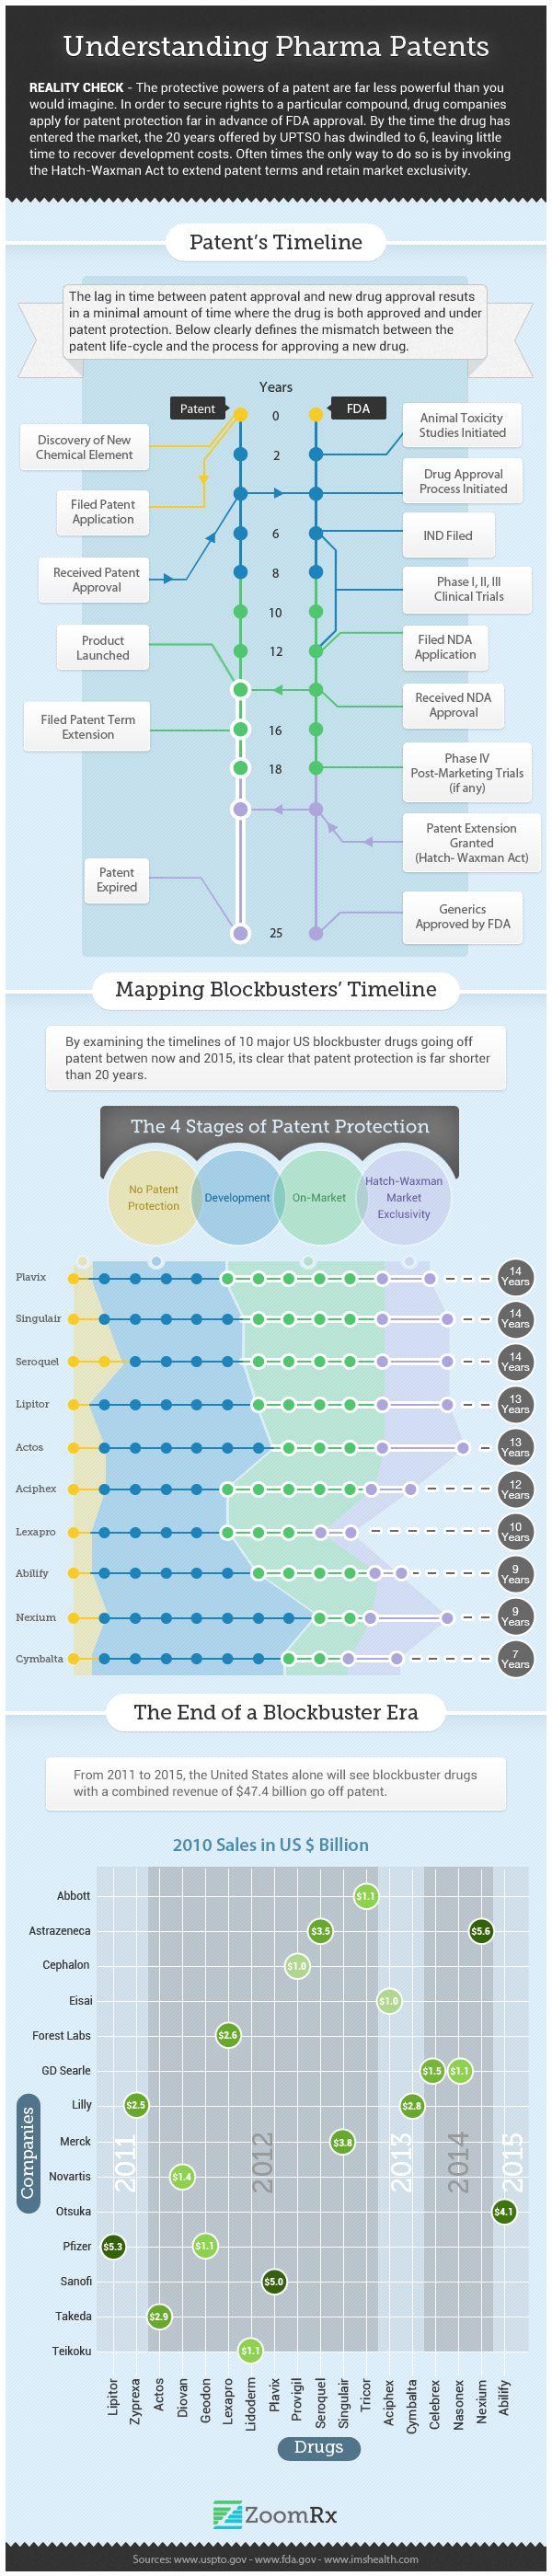 Understanding Pharma Patents